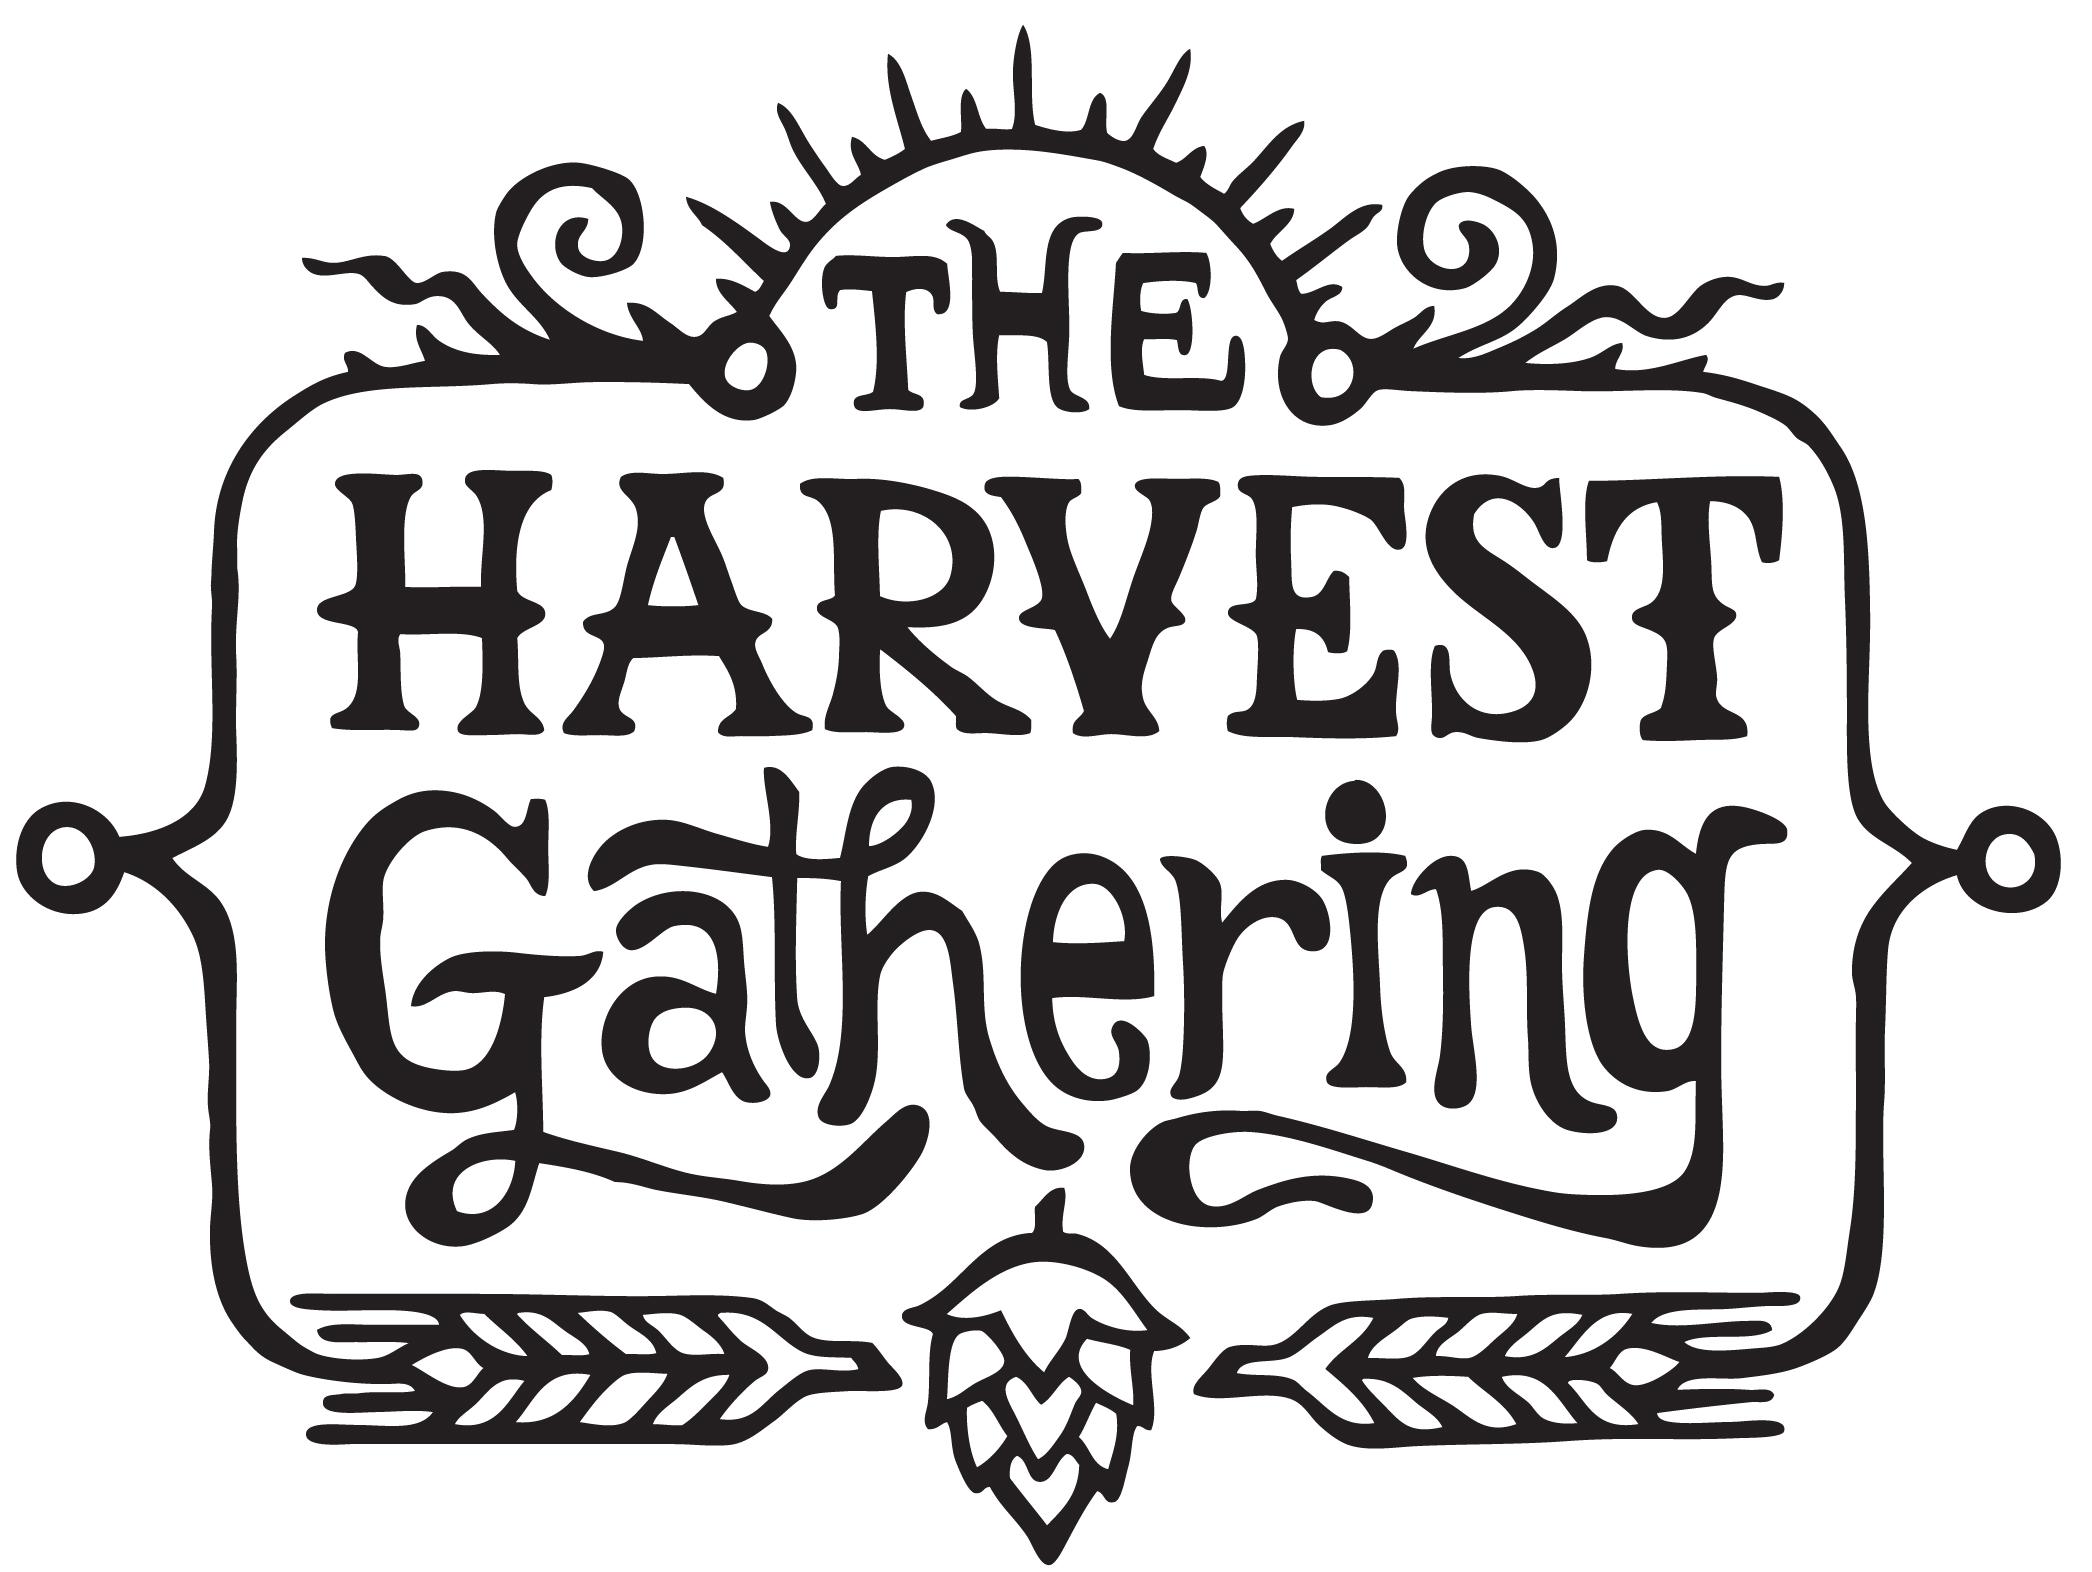 Harvest Gathering logo.jpg